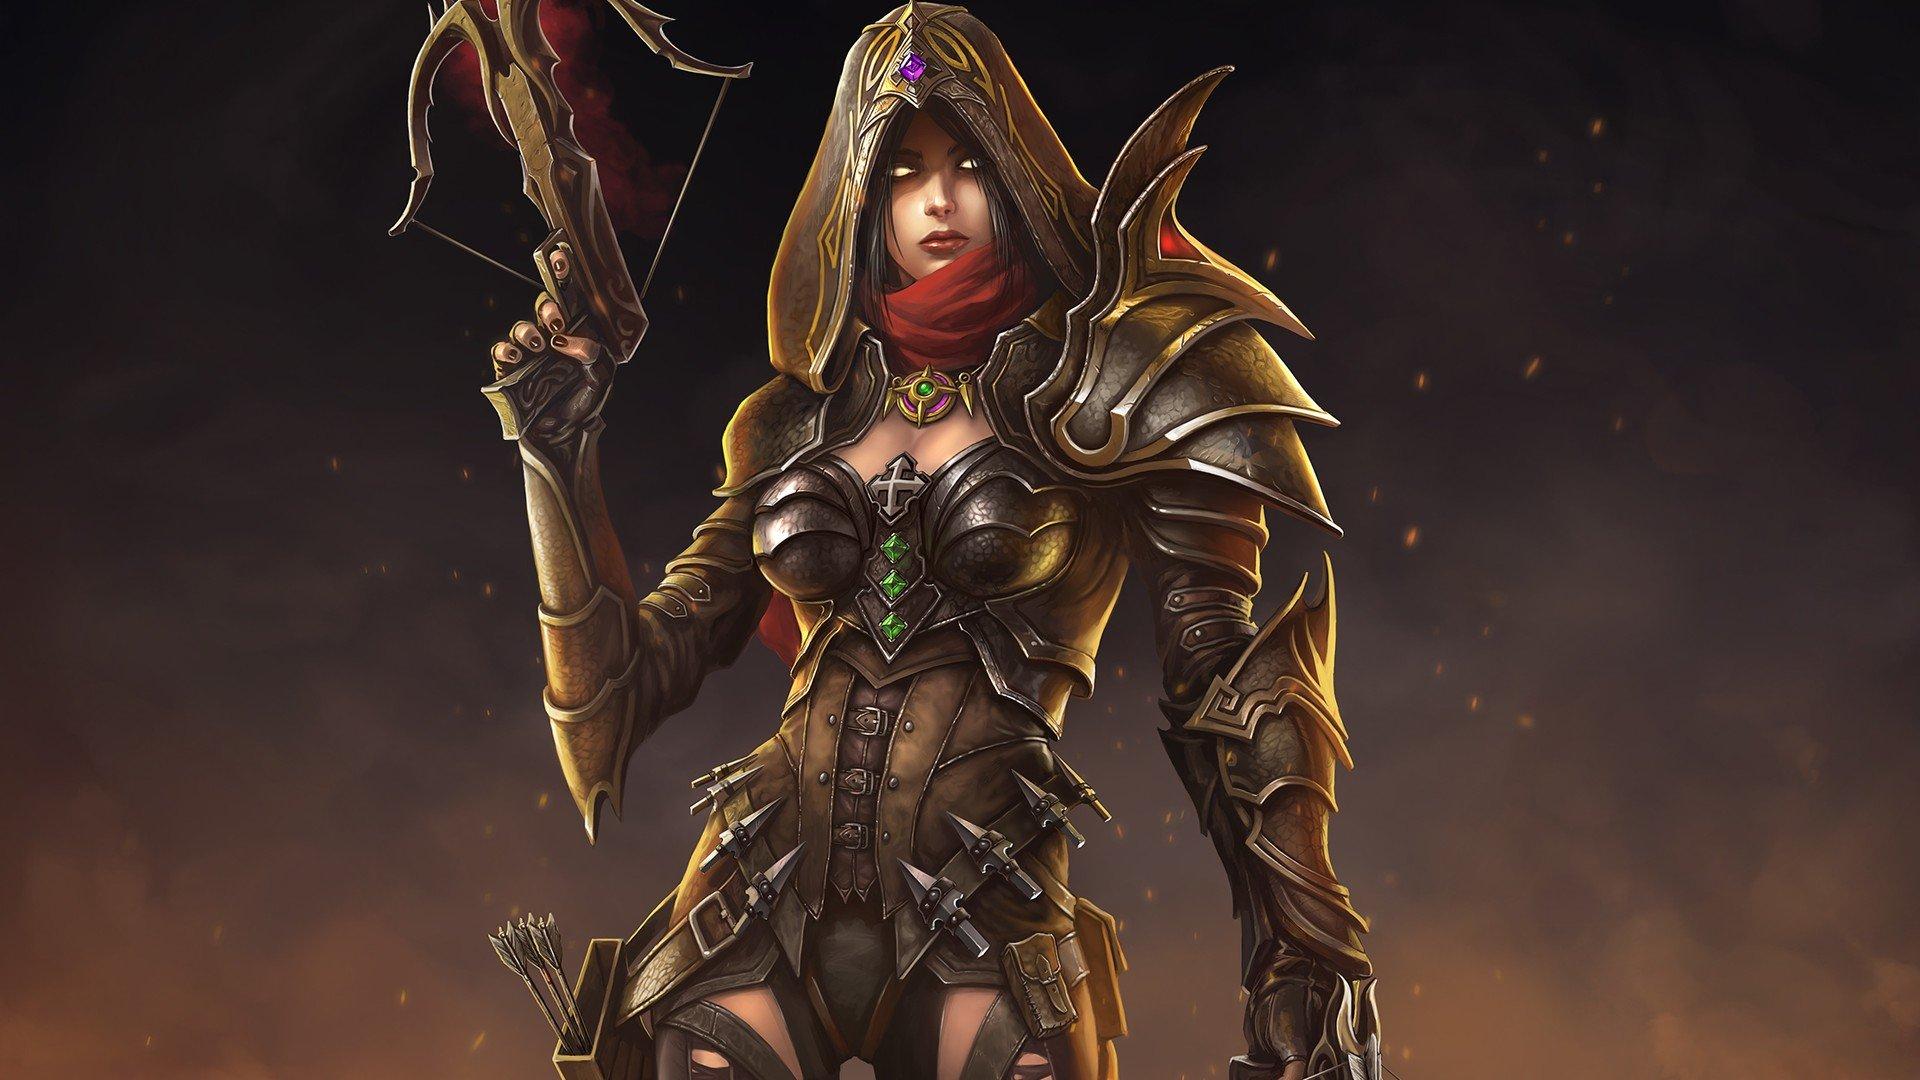 Women Valla Fantasy Art Diablo Iii Video Games Demon Hunter Diablo Hd Wallpapers Desktop And Mobile Images Photos